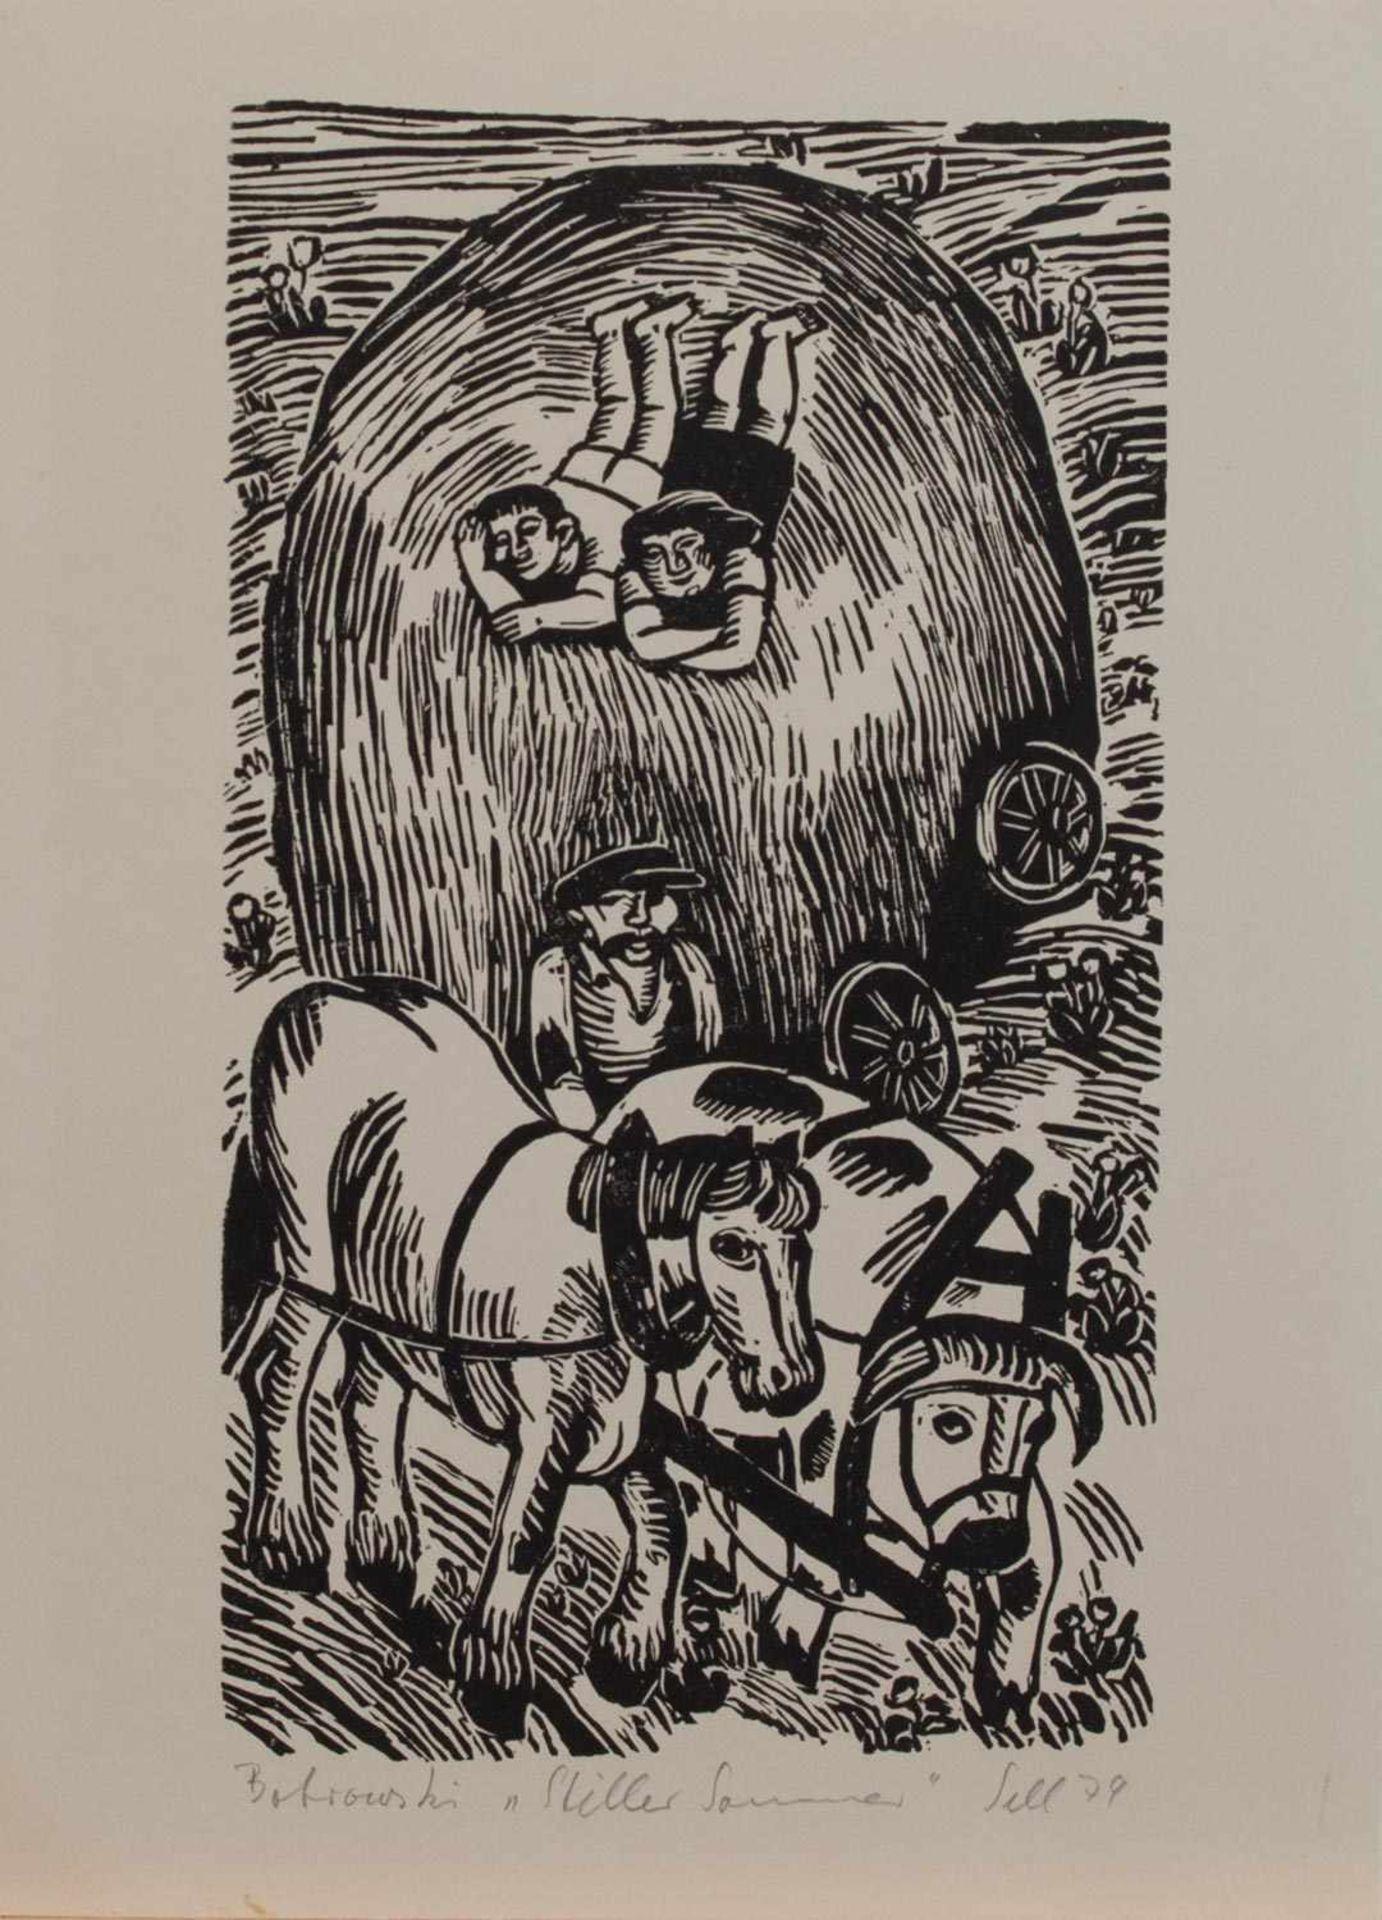 Lothar Sell (Treuenbrietzen 1939 - 2009 Meißen, deutscher Grafiker, Illustrator u. Keramiker, Std.